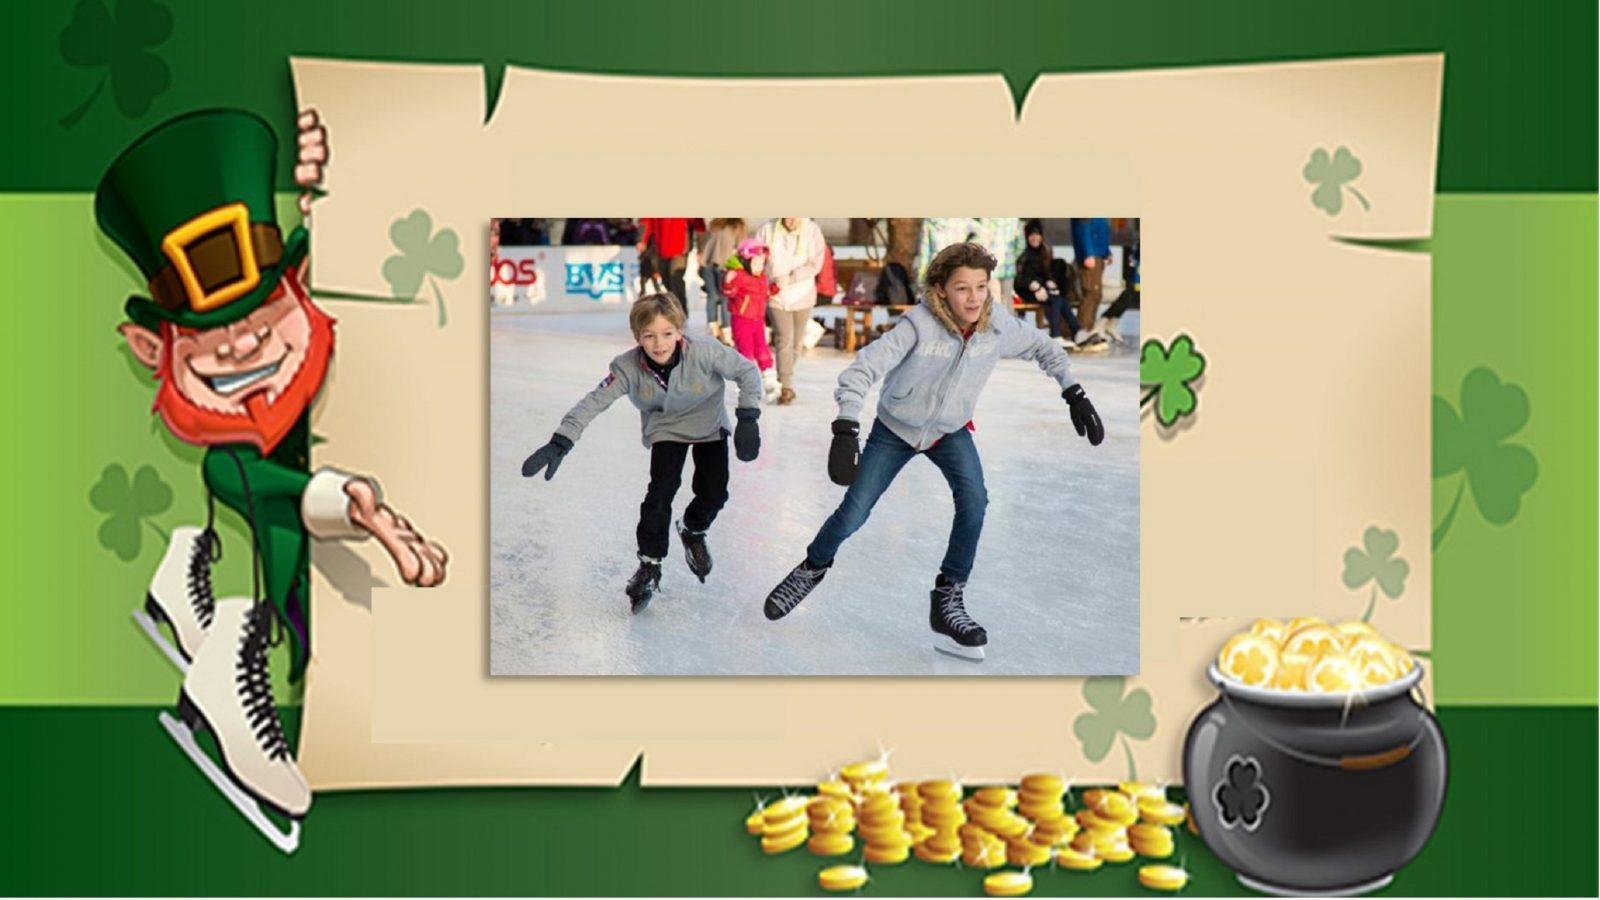 Skate with Ice Zoo Leprechaun